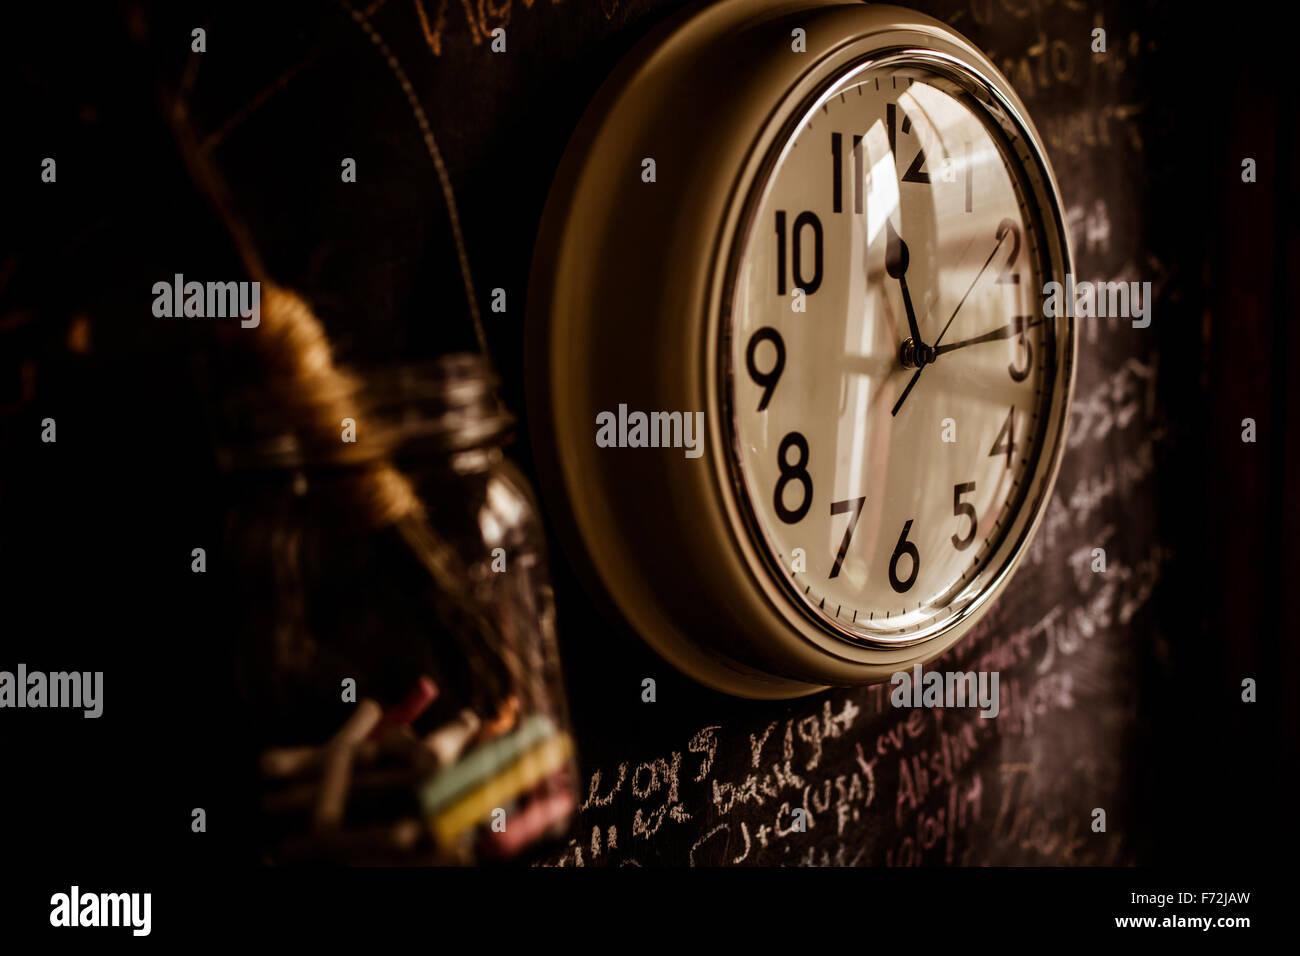 Clock on kitchen wall - Stock Image